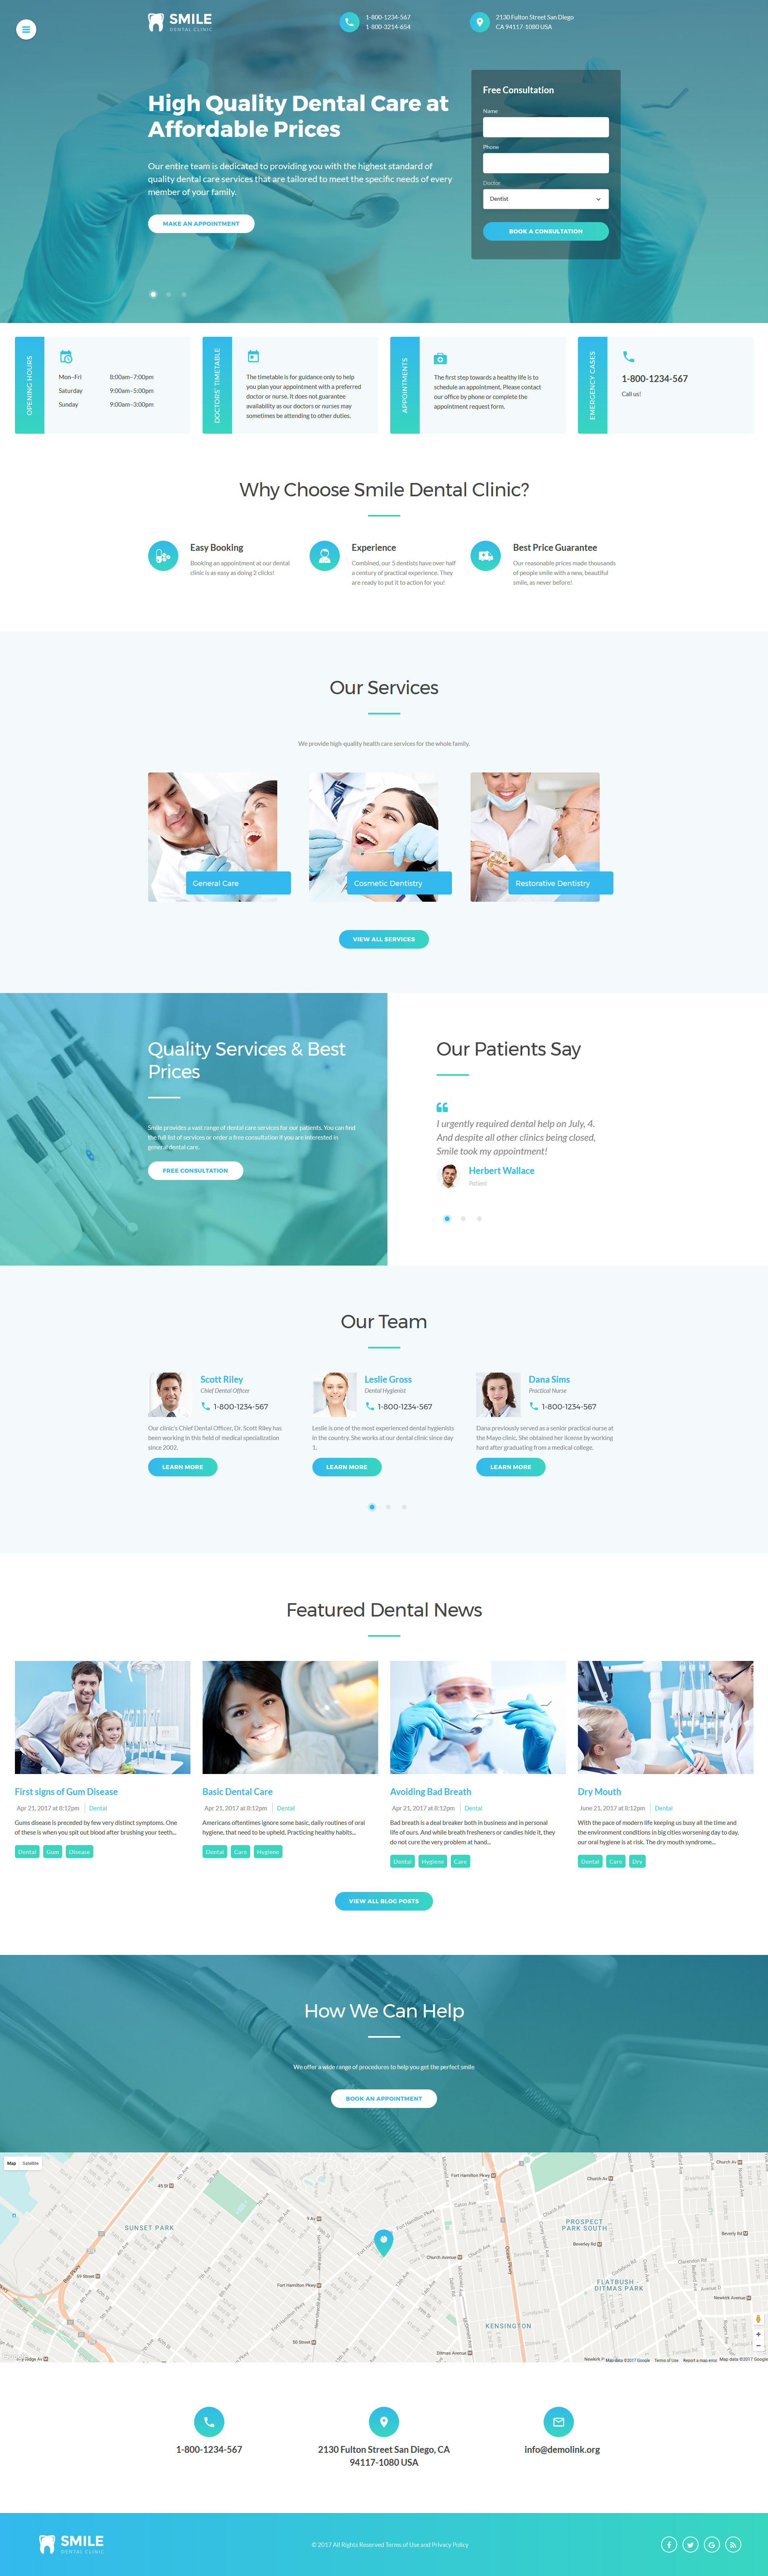 Dentistry Responsive Website Template - screenshot